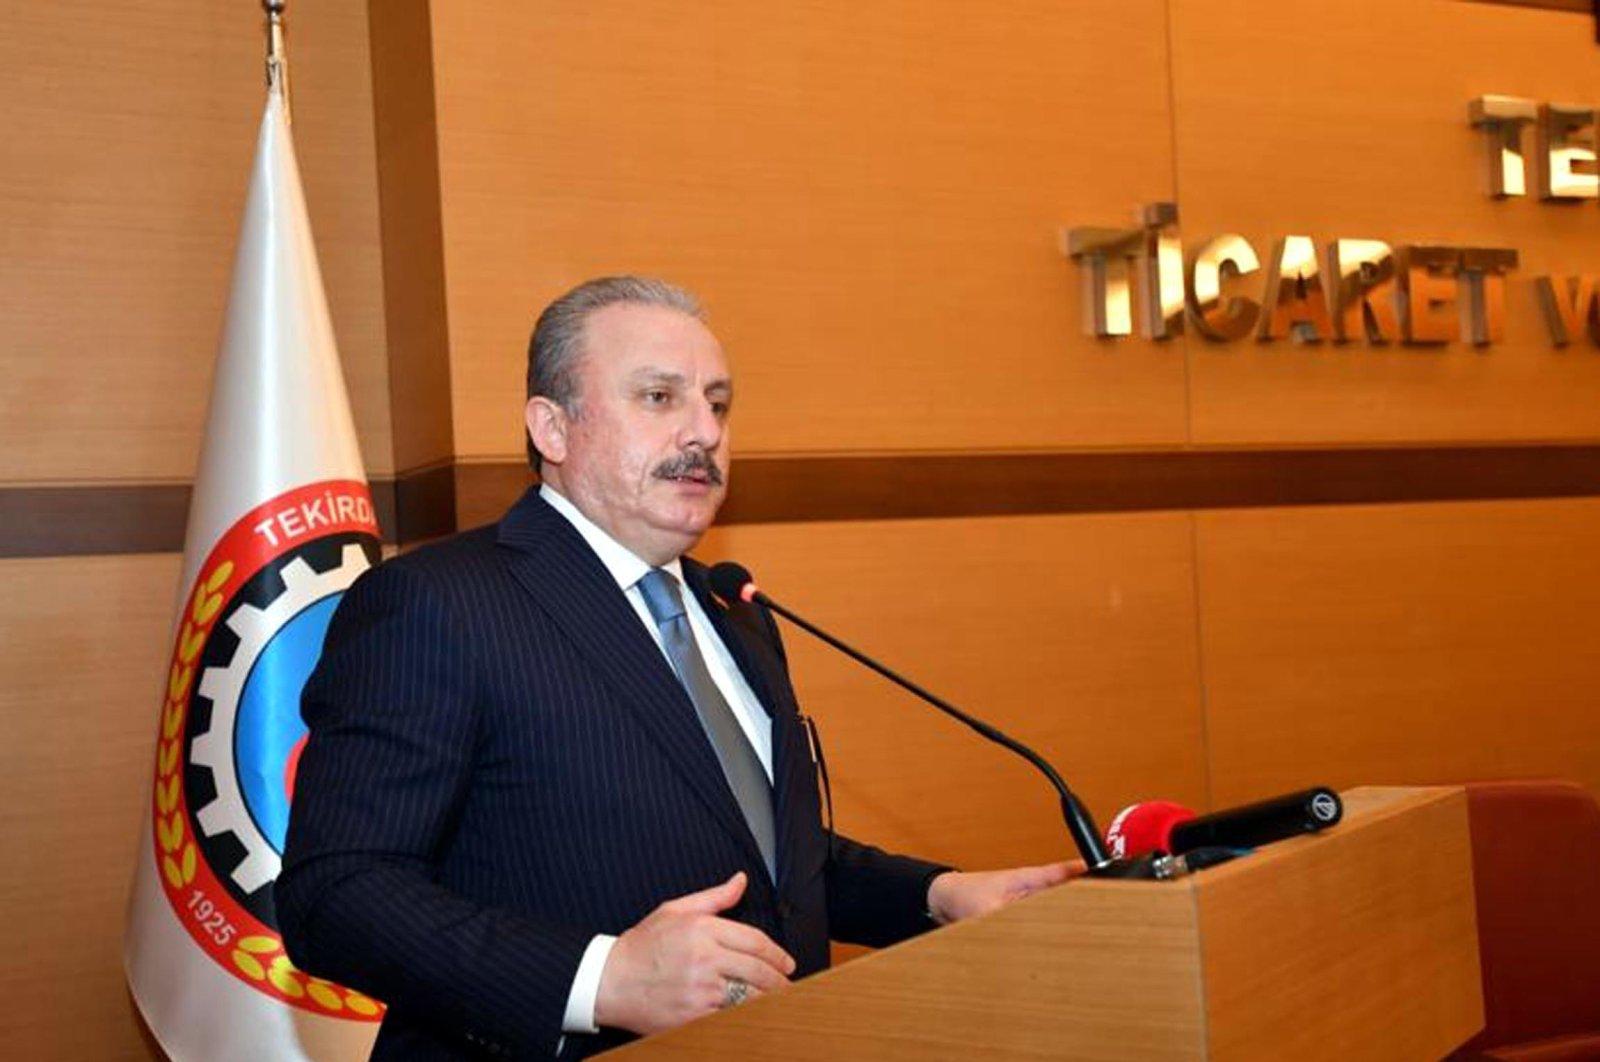 Parliament Speaker Mustafa Şentop speaks during a visit to Turkey's Tekirdağ province, June 20, 2020. (DHA Photo)